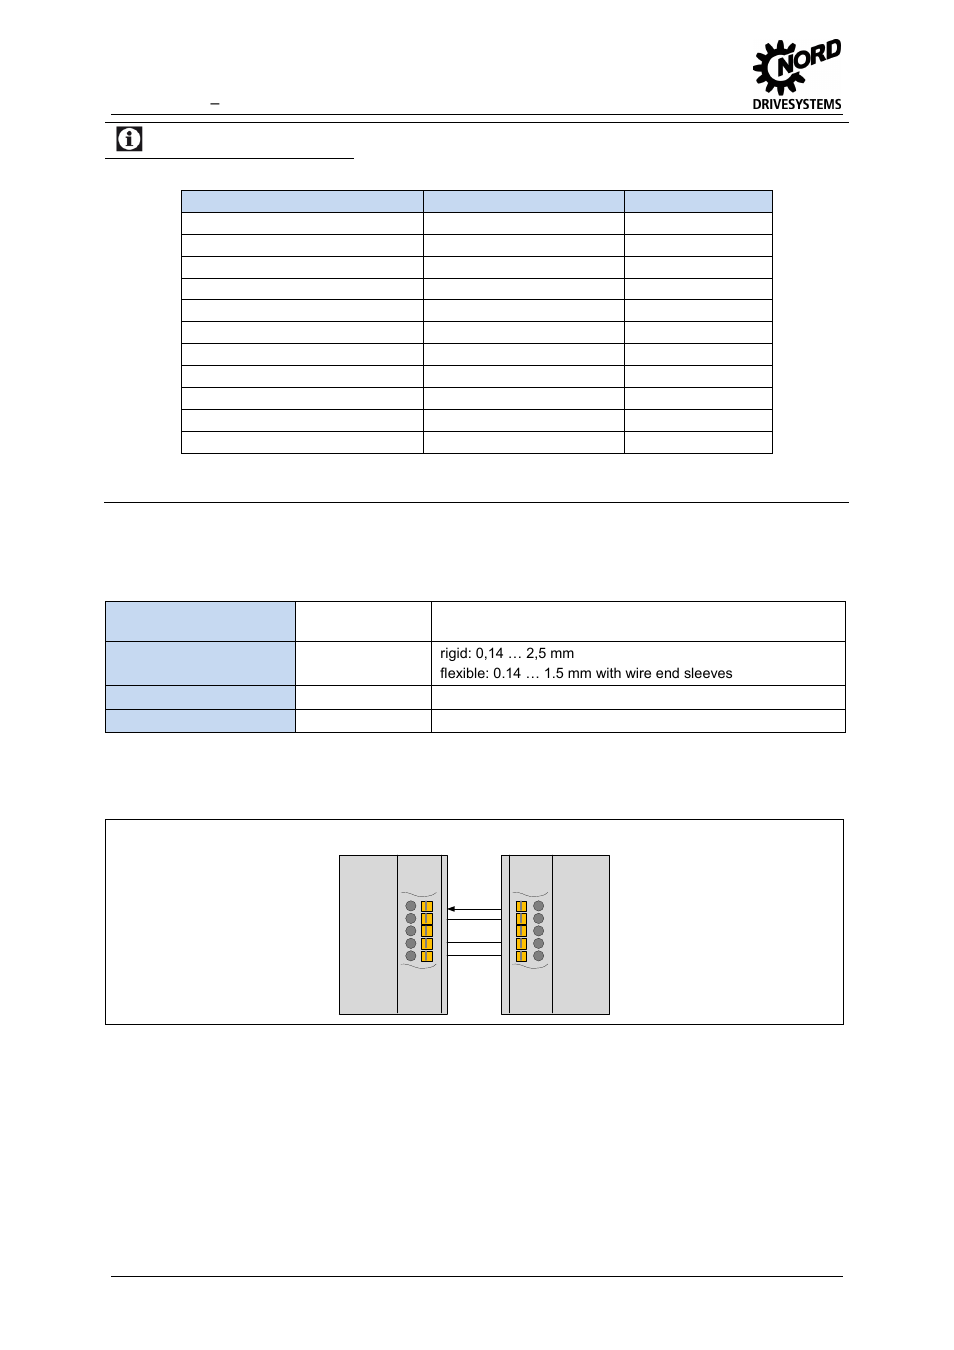 Connections, Information, M12 round plug connectors | NORD ... on din connector pinout diagram, obd2 connector wiring diagram, 4 pin connector wiring diagram, 7 wire connector wiring diagram, m12 connectors 7 pin, db9 connector wiring diagram, 6 pin connector wiring diagram, fanuc alpha series encoder diagram, deutsch connector wiring diagram, phoenix connector wiring diagram, 9 pin connector wiring diagram, m12 sensor cables diagram, 8 pin connector wiring diagram,